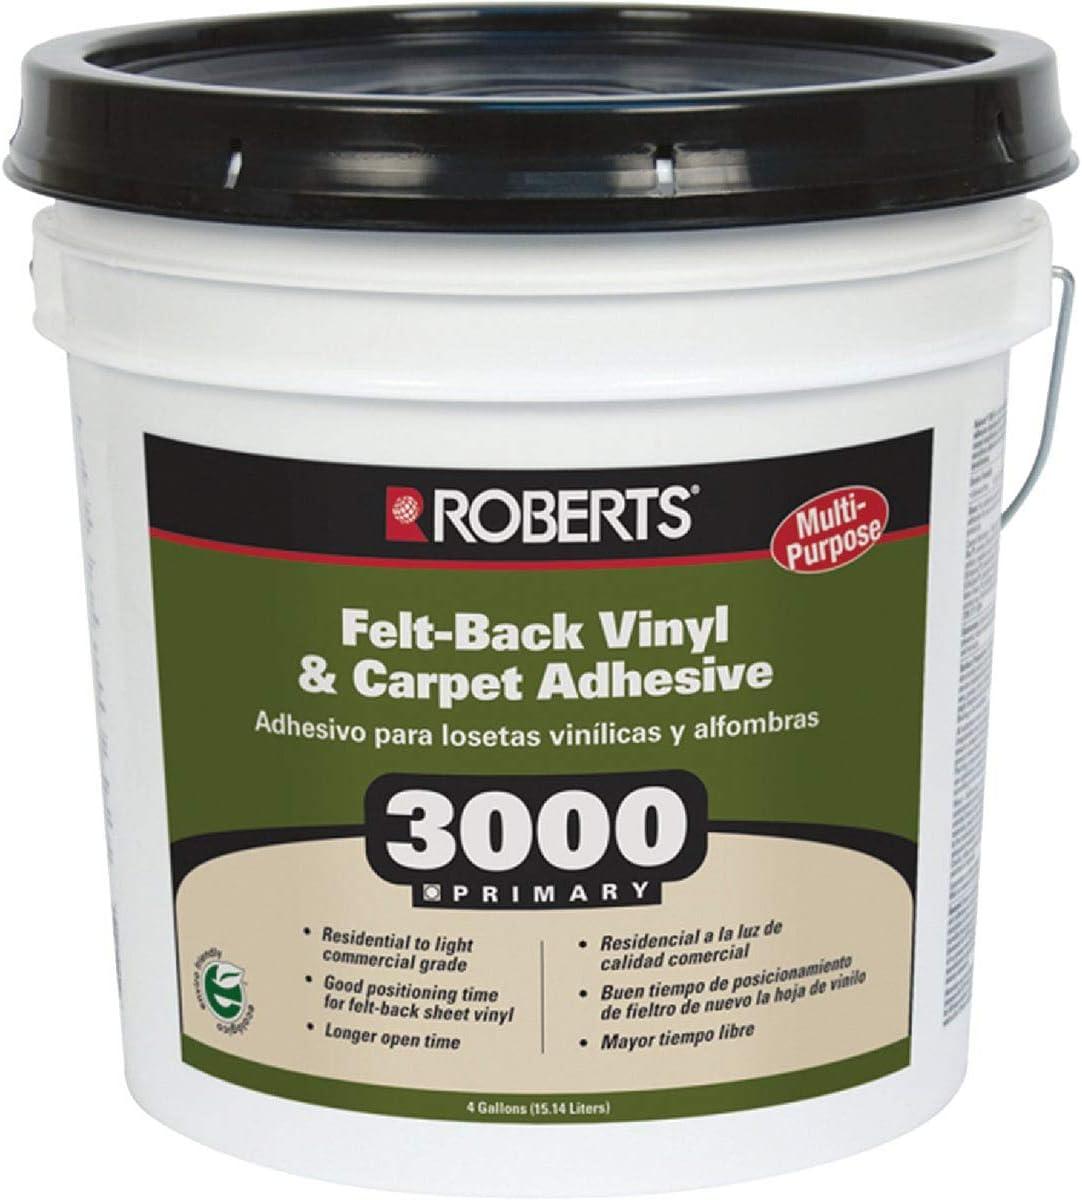 Roberts Q E P 3000-4 Floor Cover Adhesive Ing San Antonio Mall Max 45% OFF